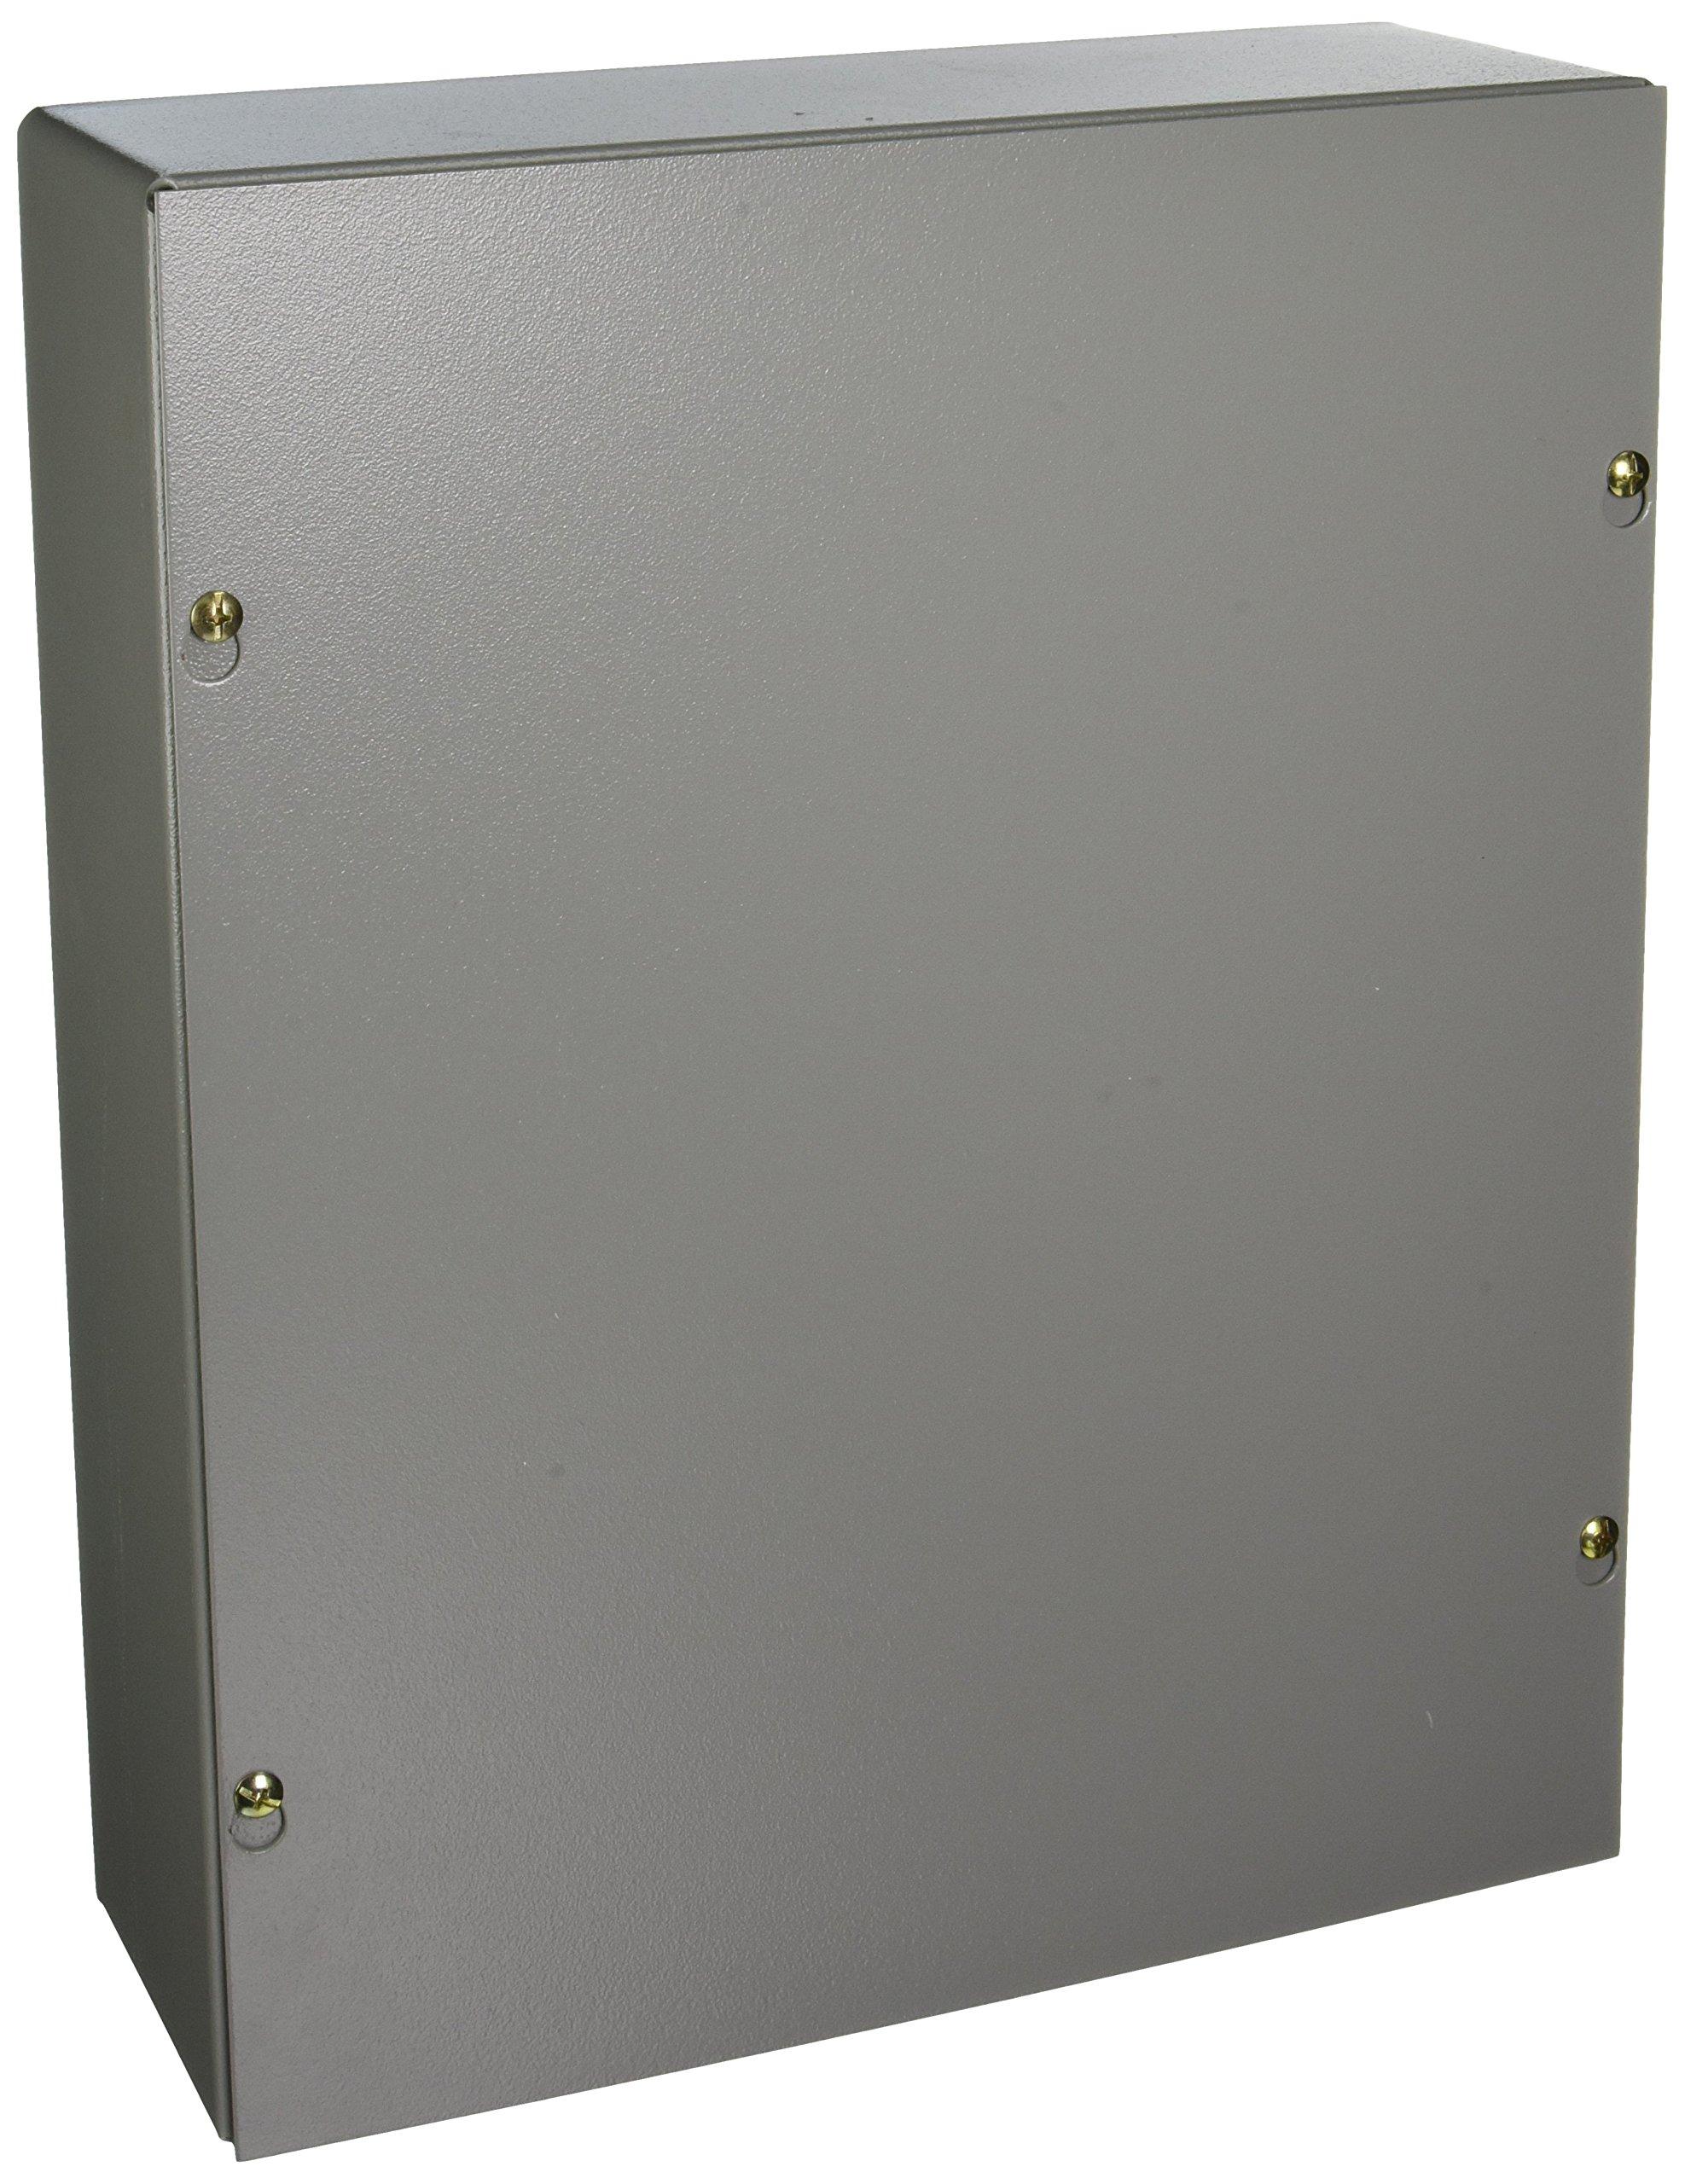 Wiegmann SC121504NK SC-Series NEMA 1 Screw Cover Wallmount Pull Box, No Knockouts, Painted Steel, 15'' x 12'' x 4''